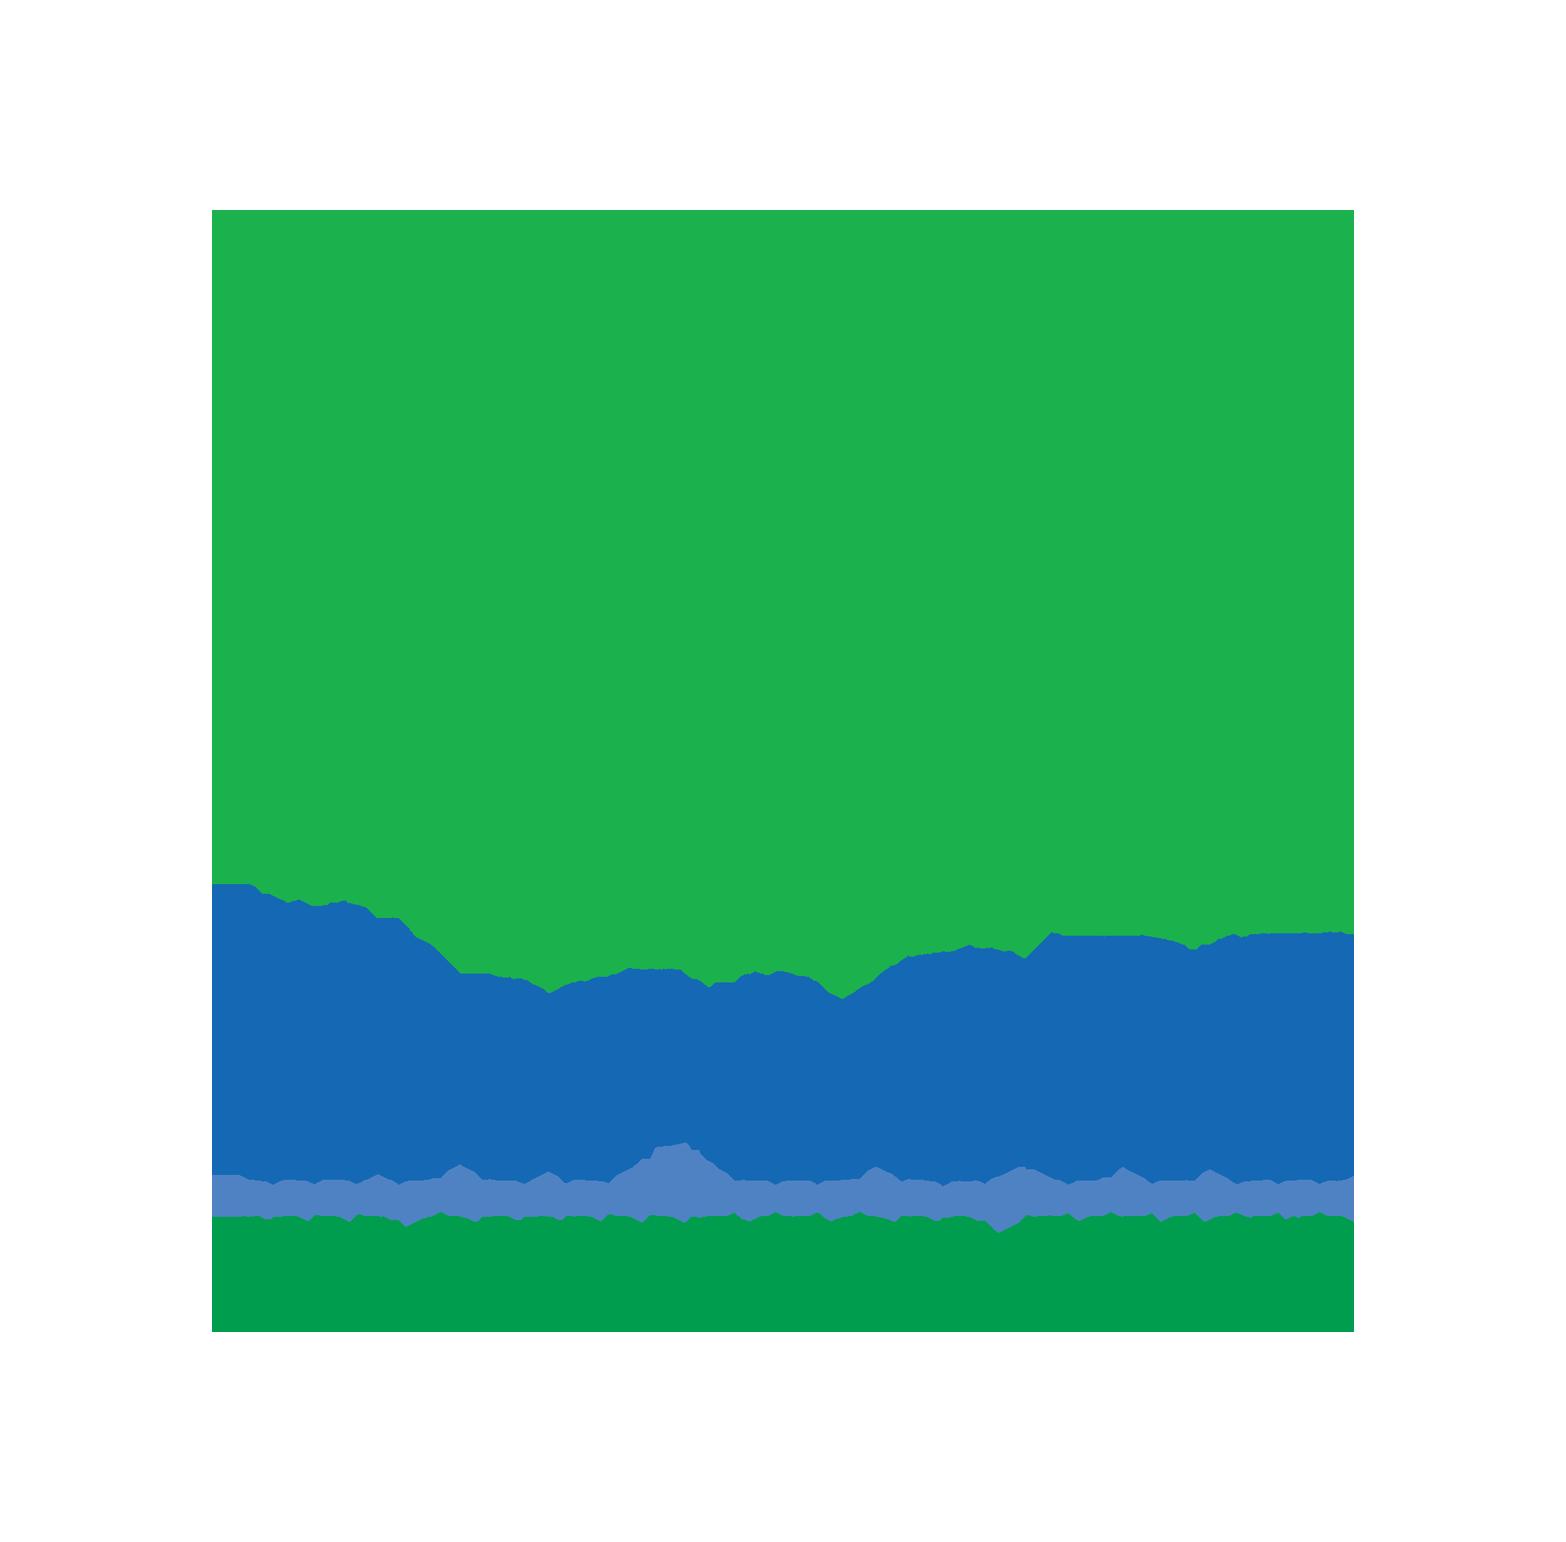 Explore Washington State Photo Contest